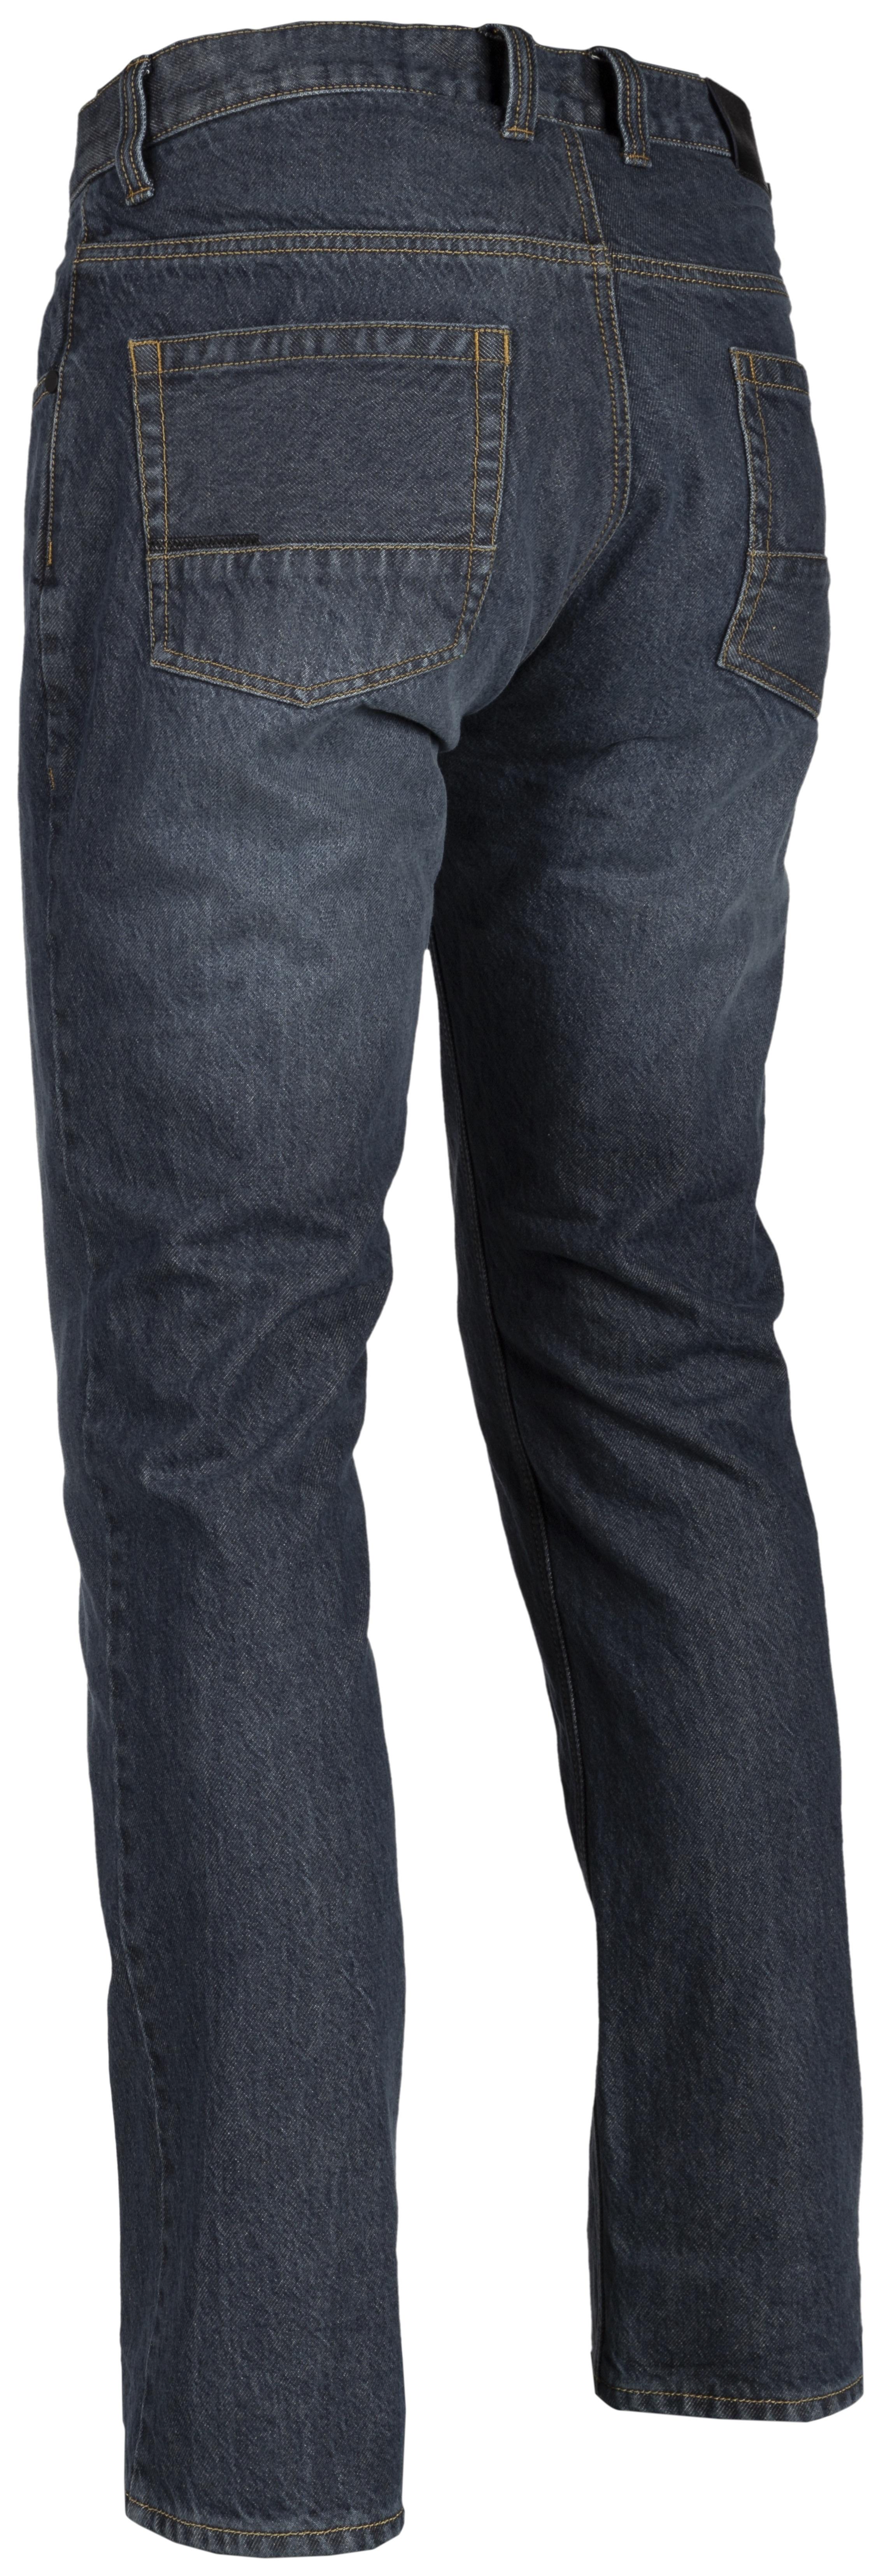 Klim 2 K Revzilla Jeans Fifty txhQrCsd